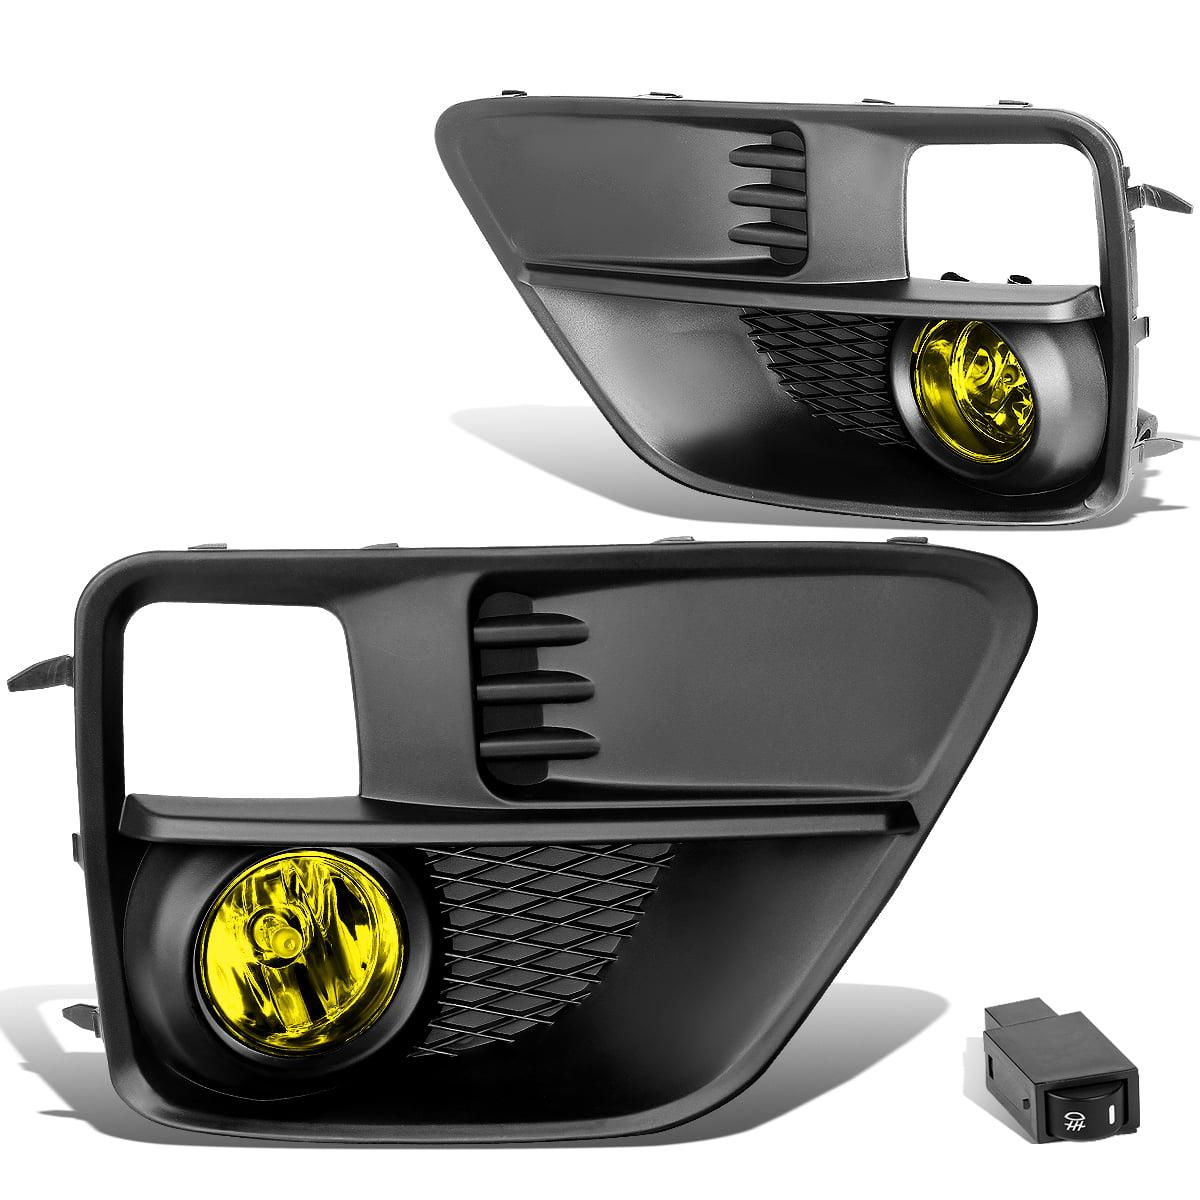 For 15-17 Subaru WRX / STI Pair of Bumper Driving Fog Lights + Wiring + Switch (Amber Lens) 16